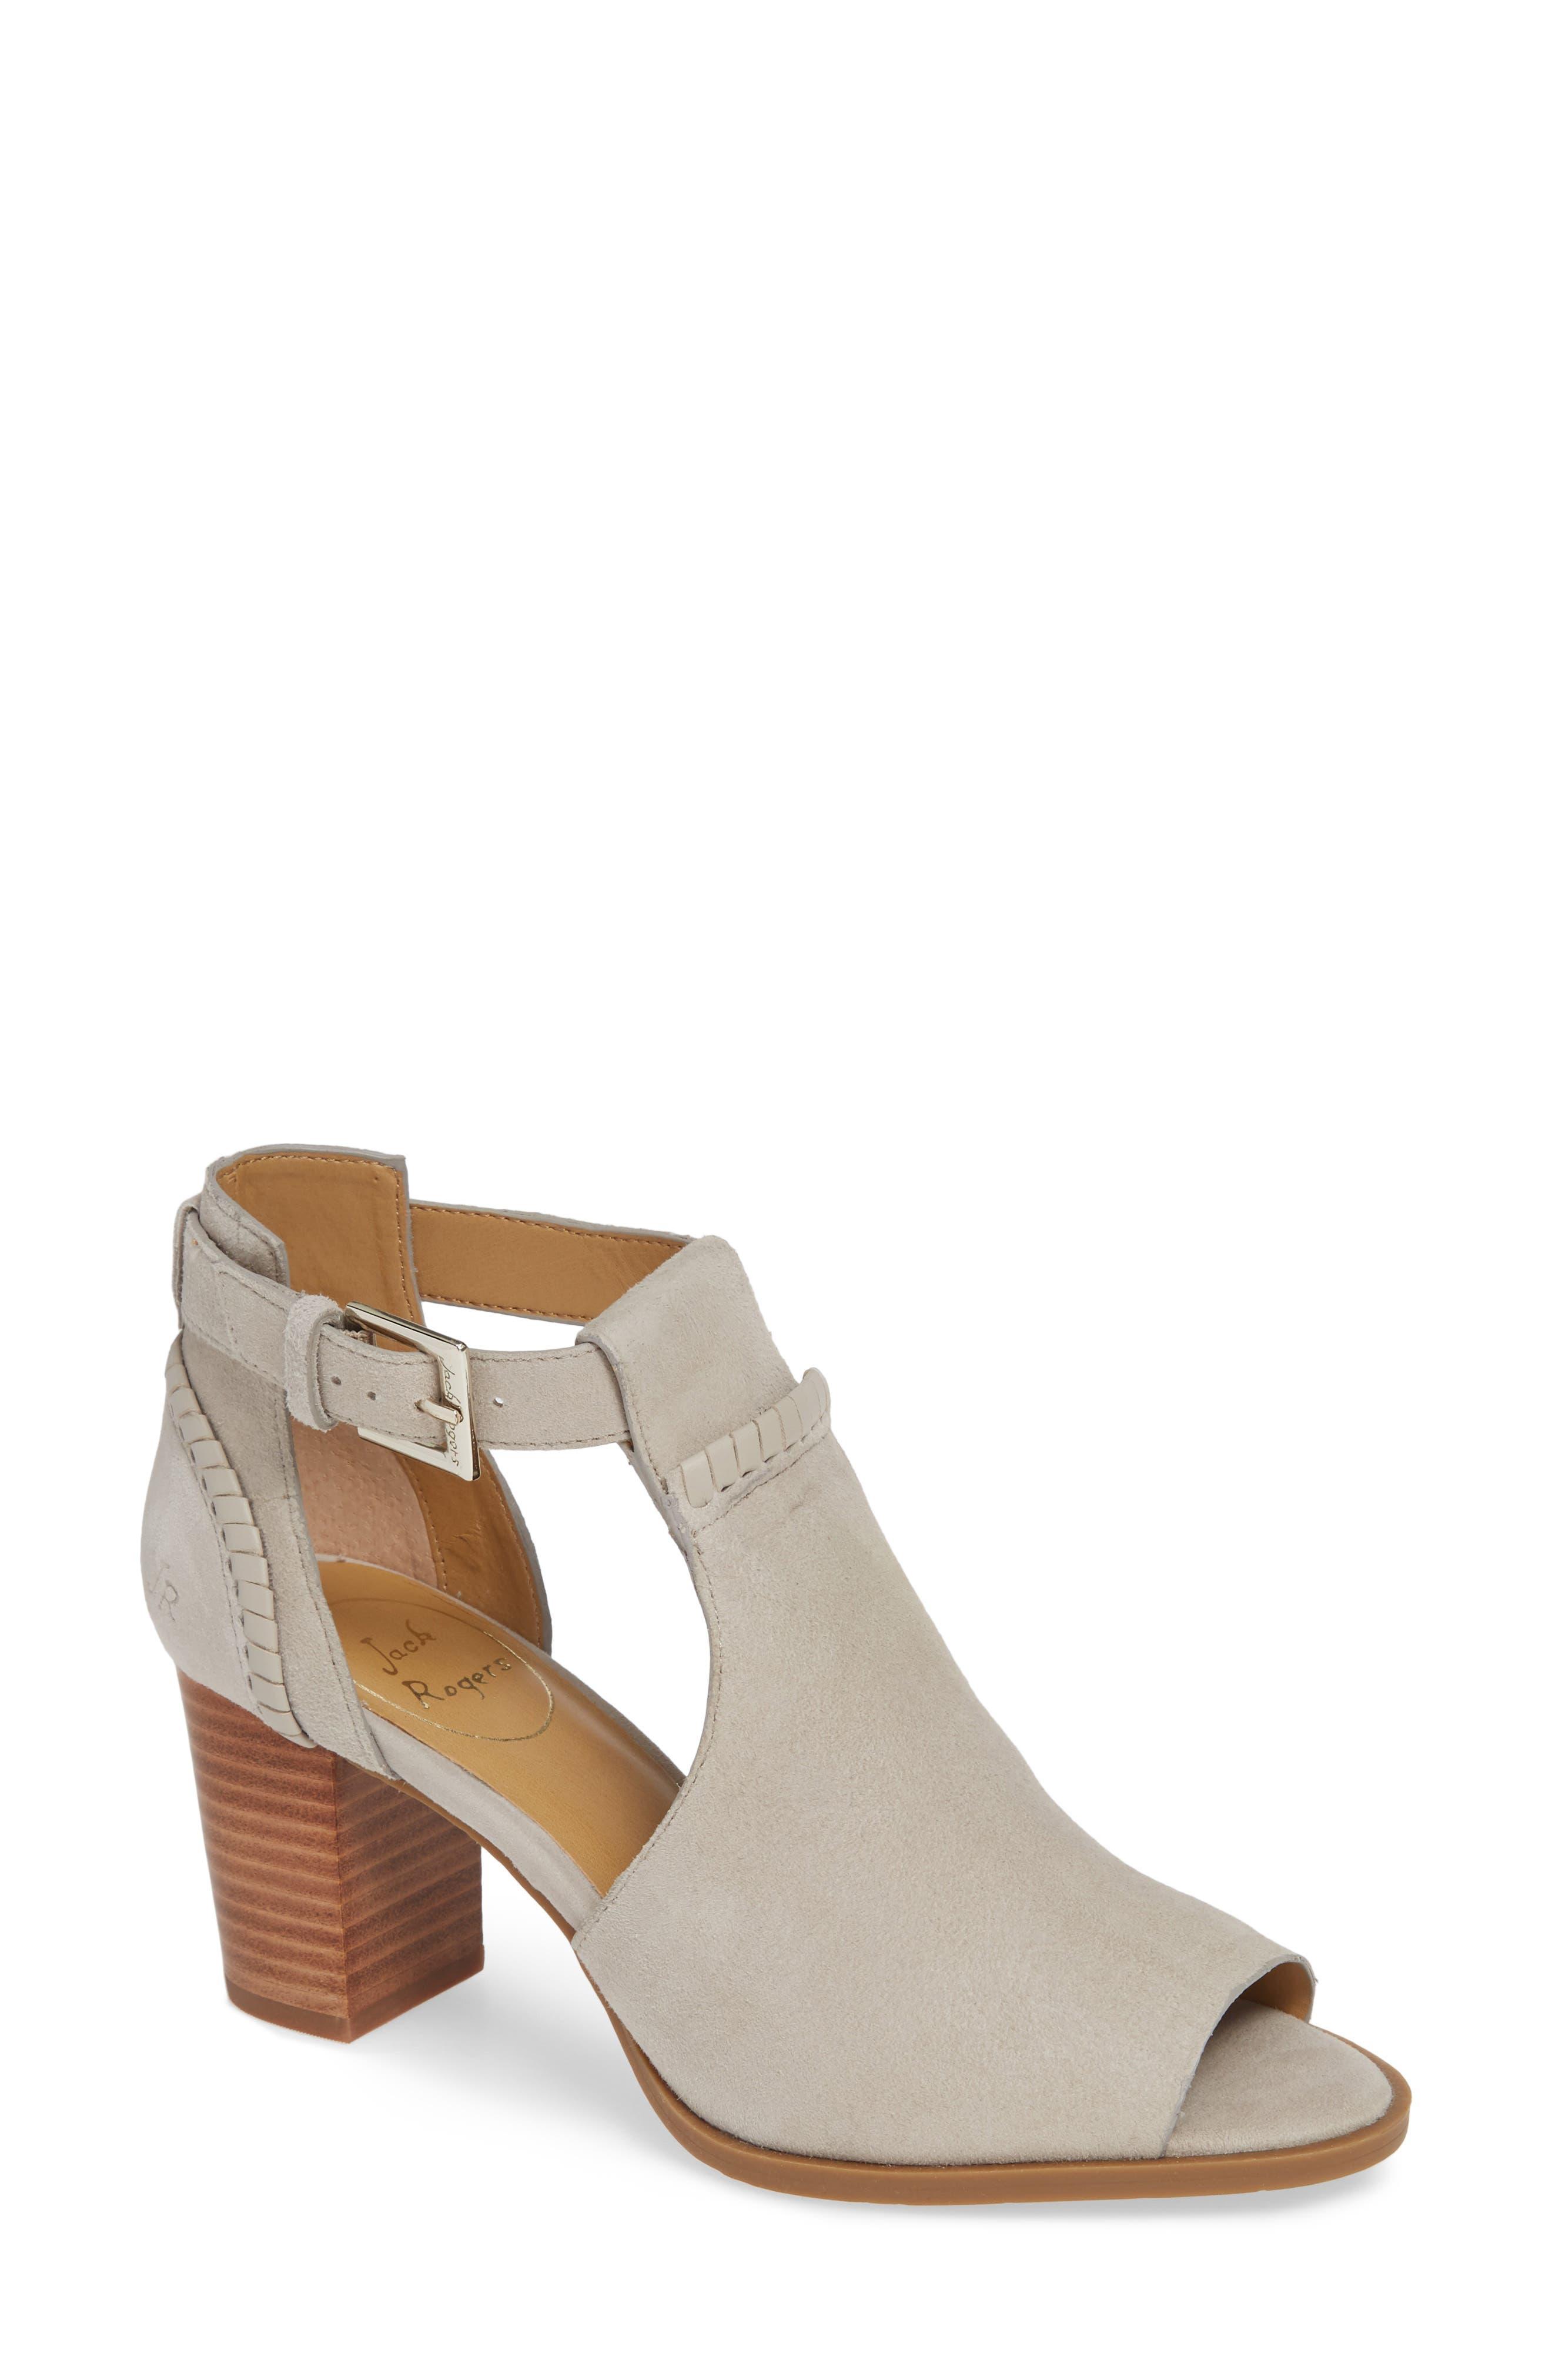 Cameron Block Heel Sandal,                         Main,                         color,